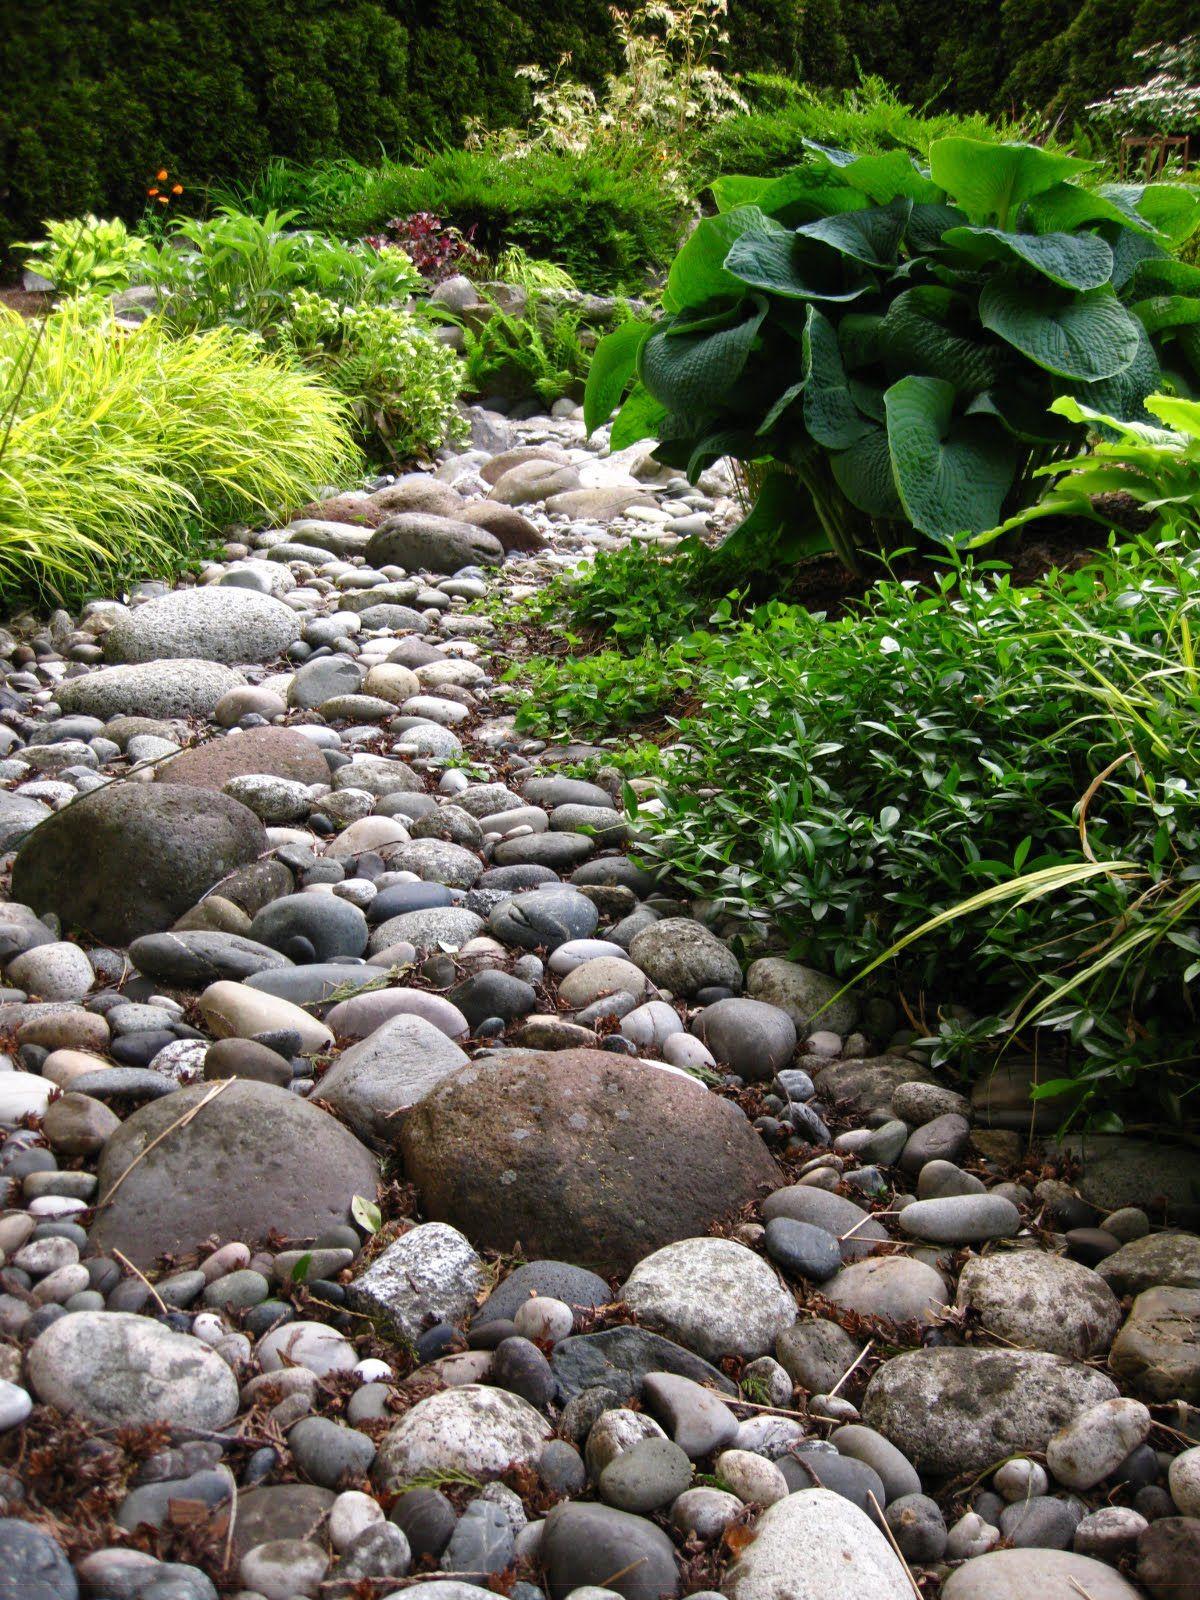 25 Rock Garden Designs Landscaping Ideas for Front Yard | Rock ...